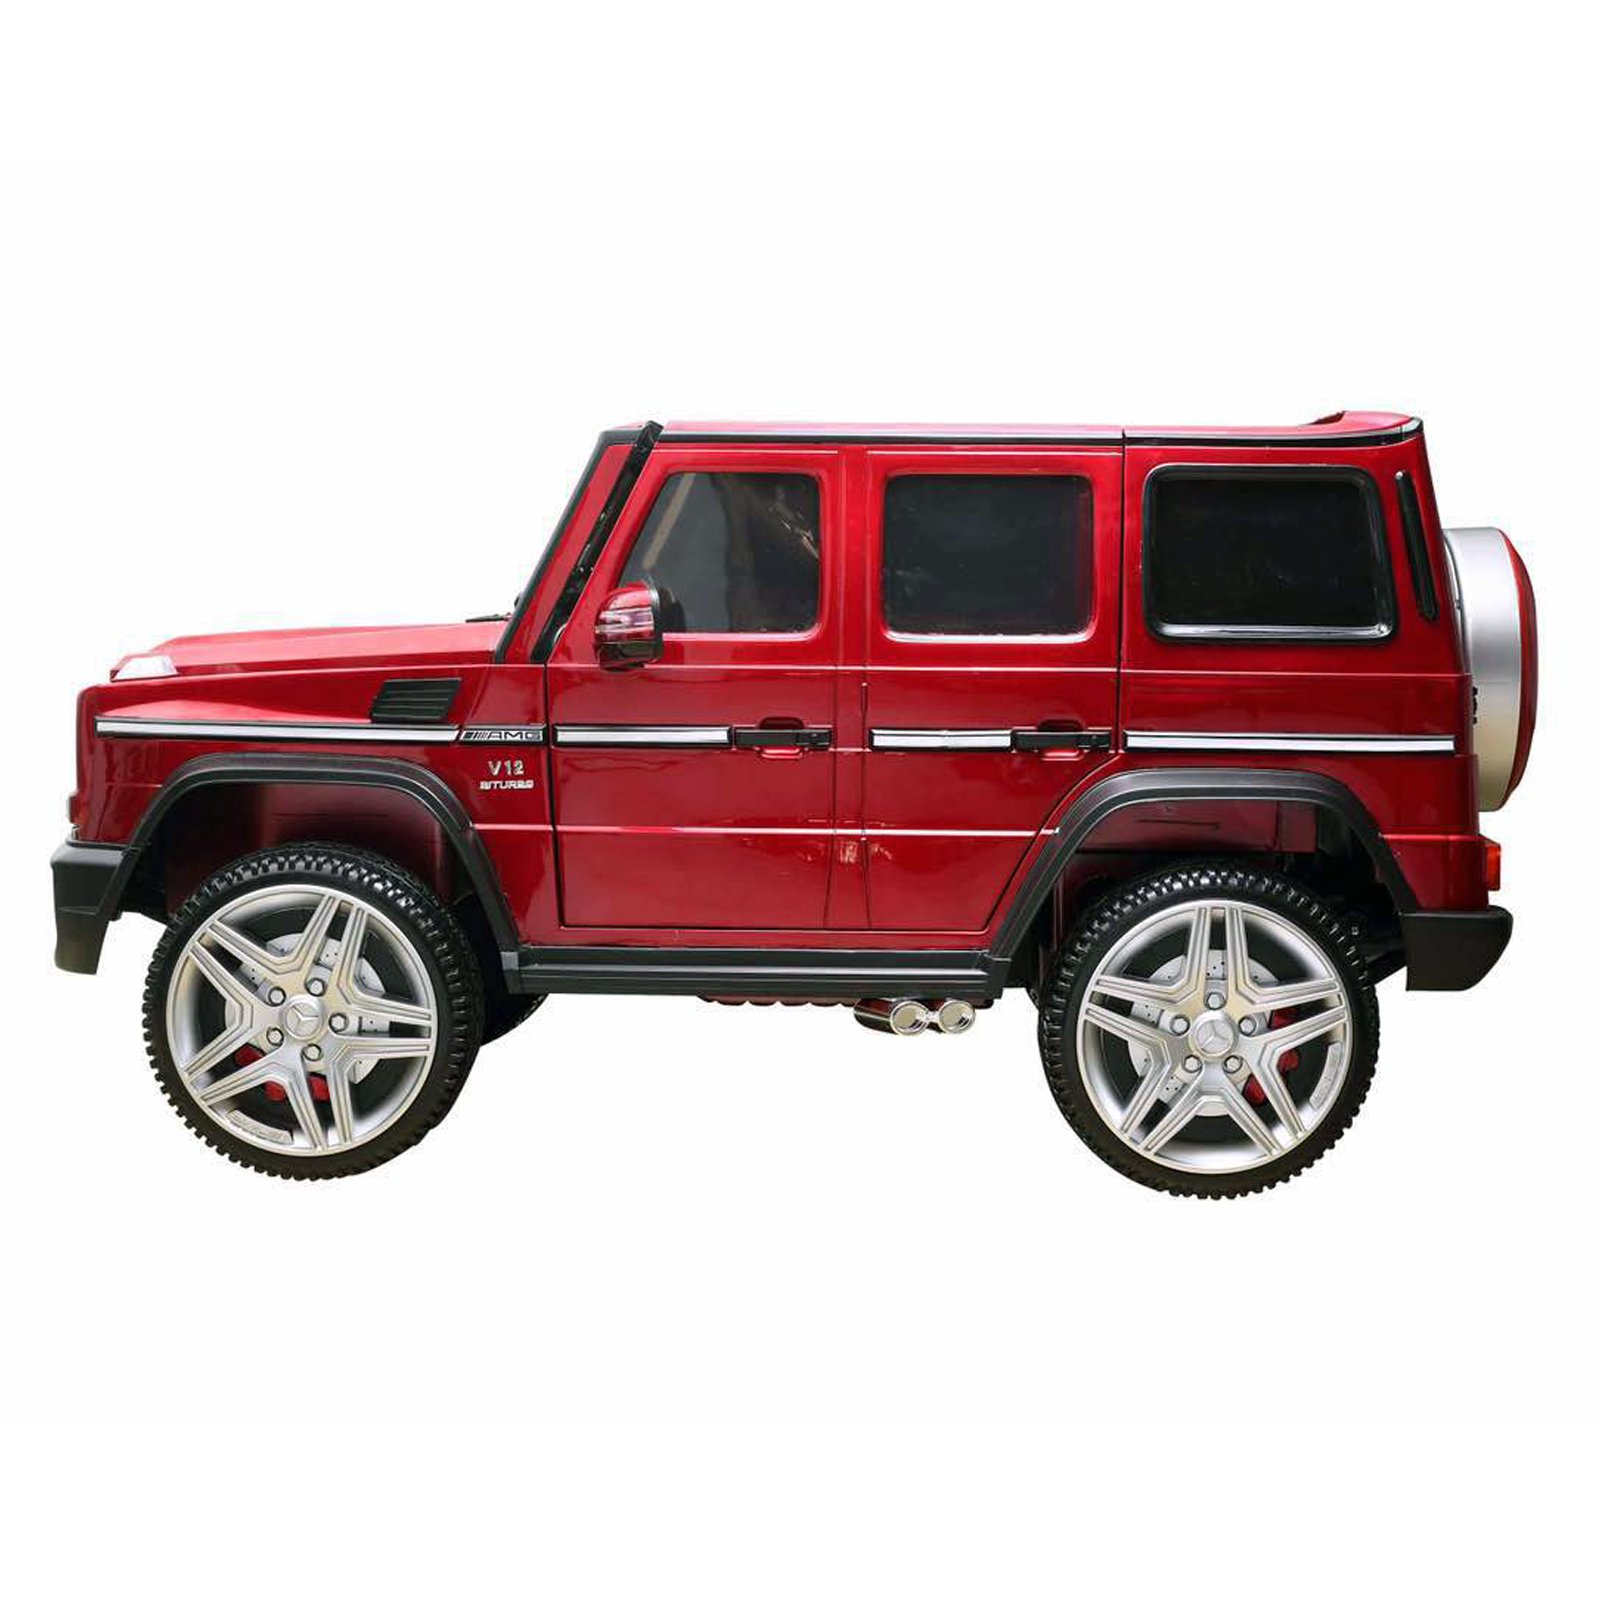 KidPlay Licensed Kids Ride On Car Mercedes G65 12V Battery Powered Vehicle - Red